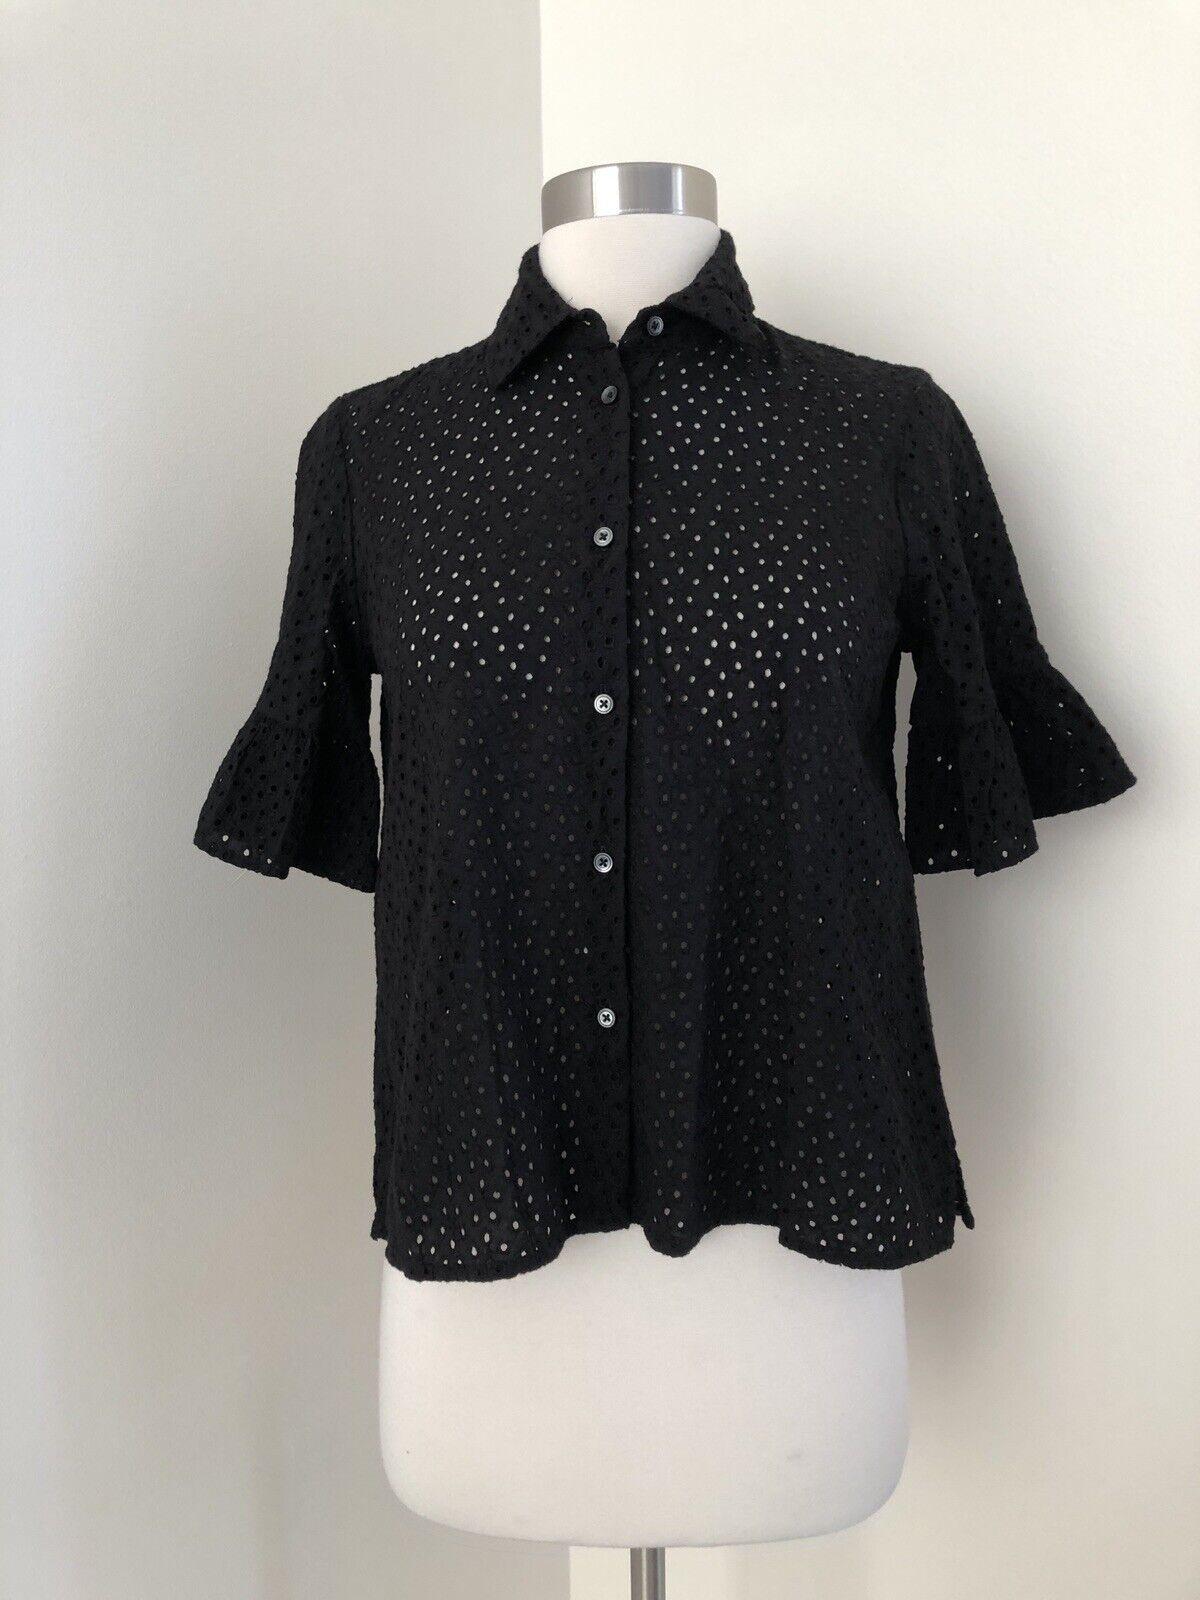 New Madewell Eyelet Bell-sleeve Shirt Sz XS G4889 True schwarz